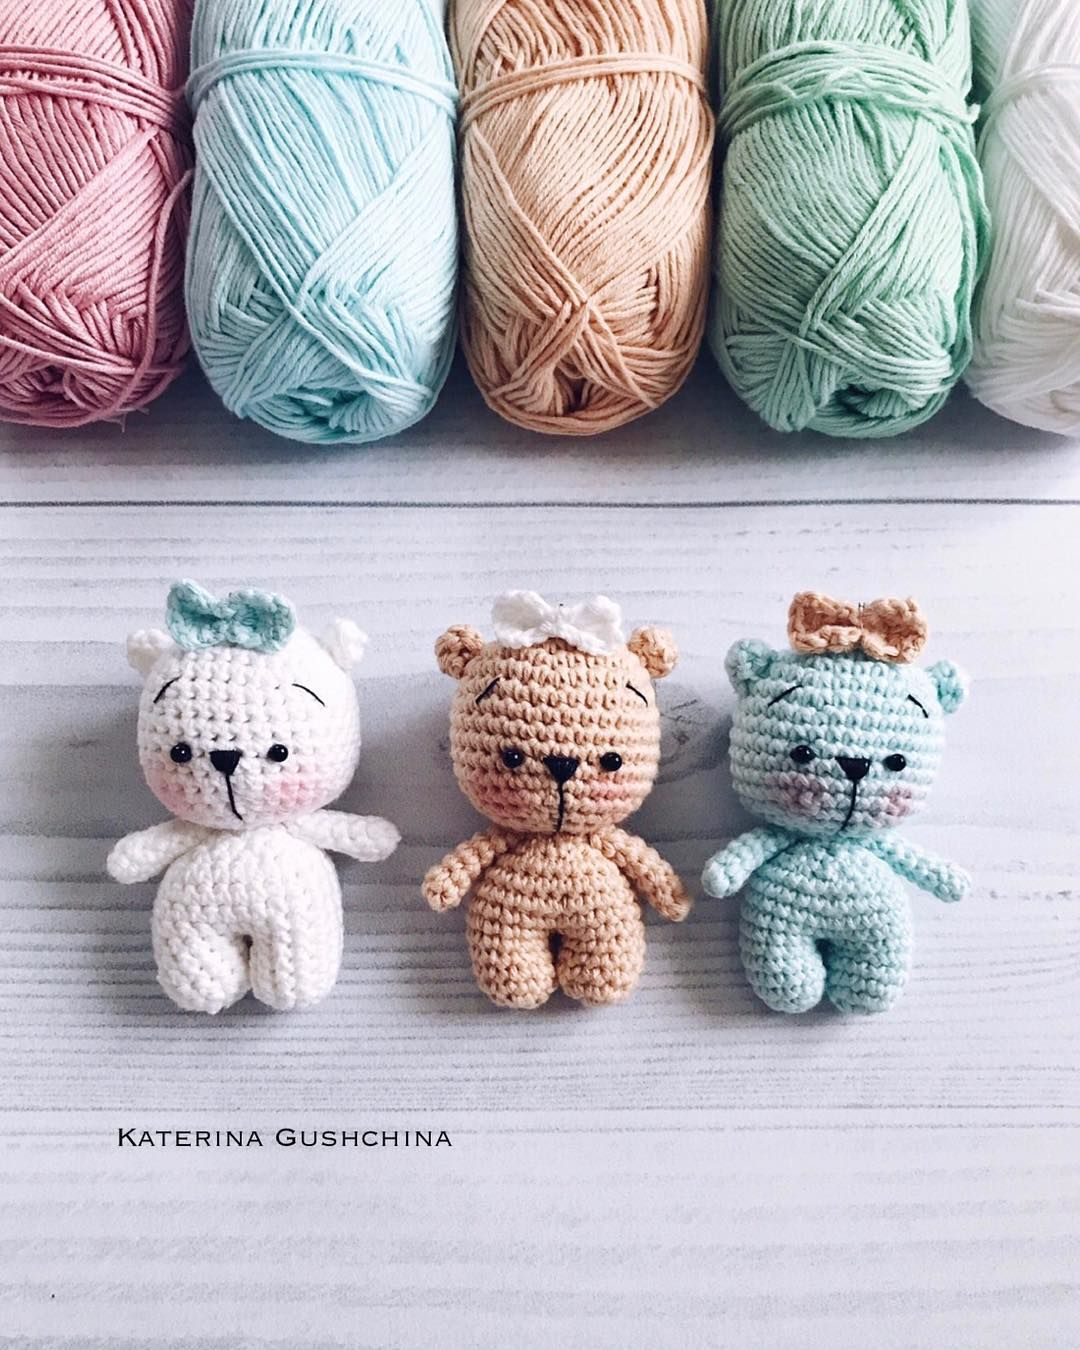 Tiny teddy bear crochet pattern #amigurumis